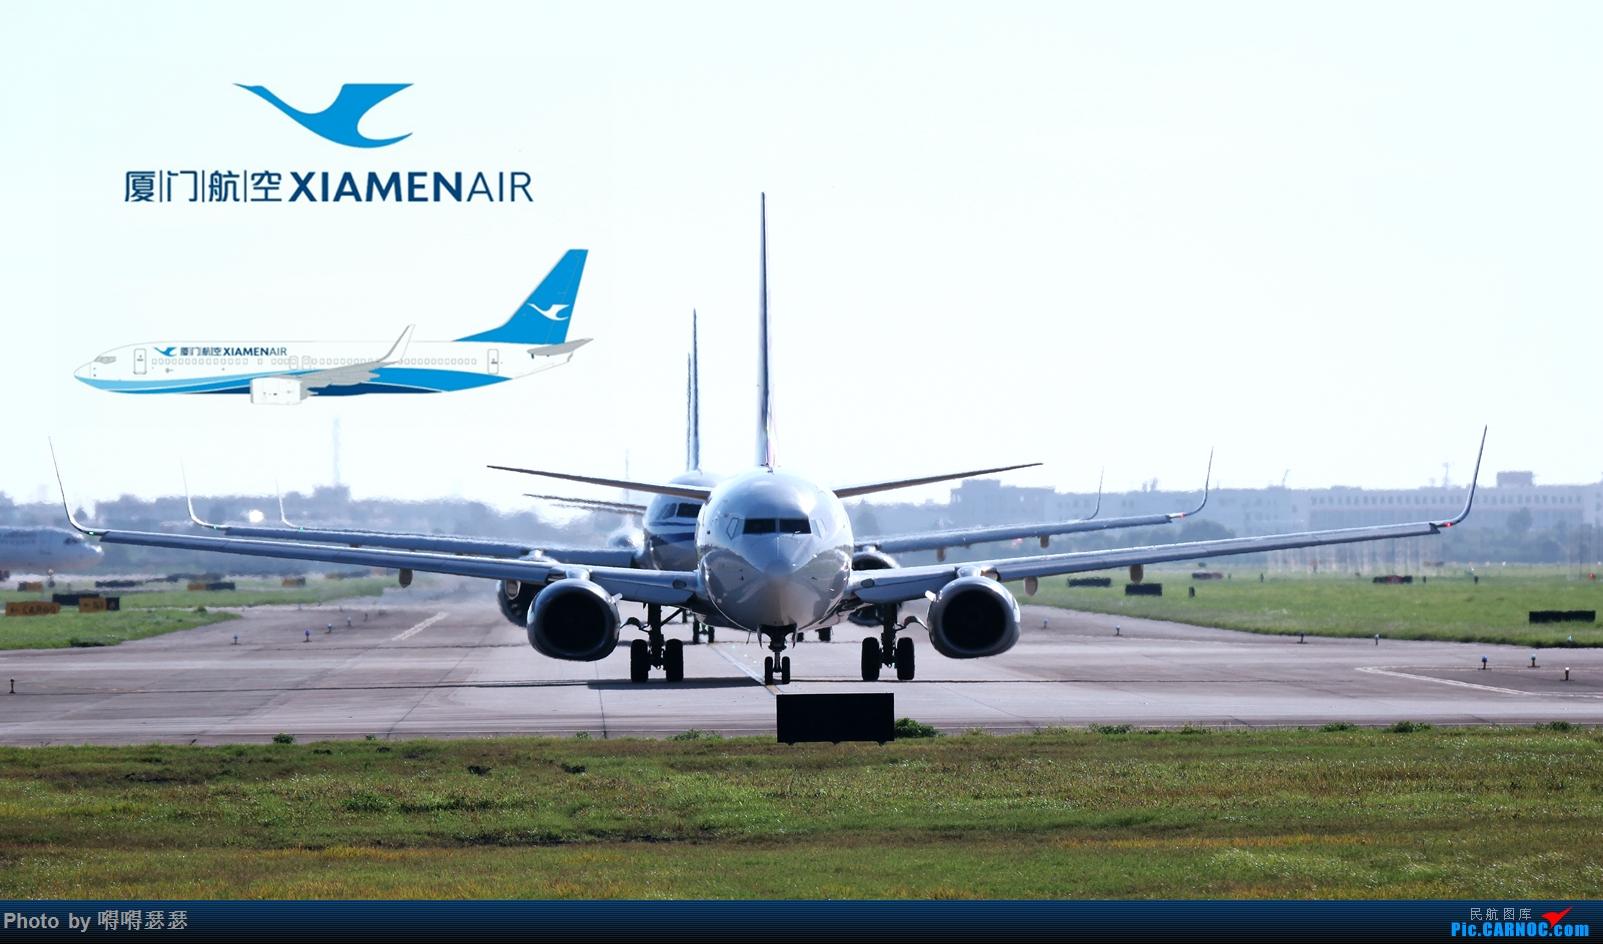 Re:[原创]账号被注销 BOEING 737-800 B-1456 中国杭州萧山国际机场